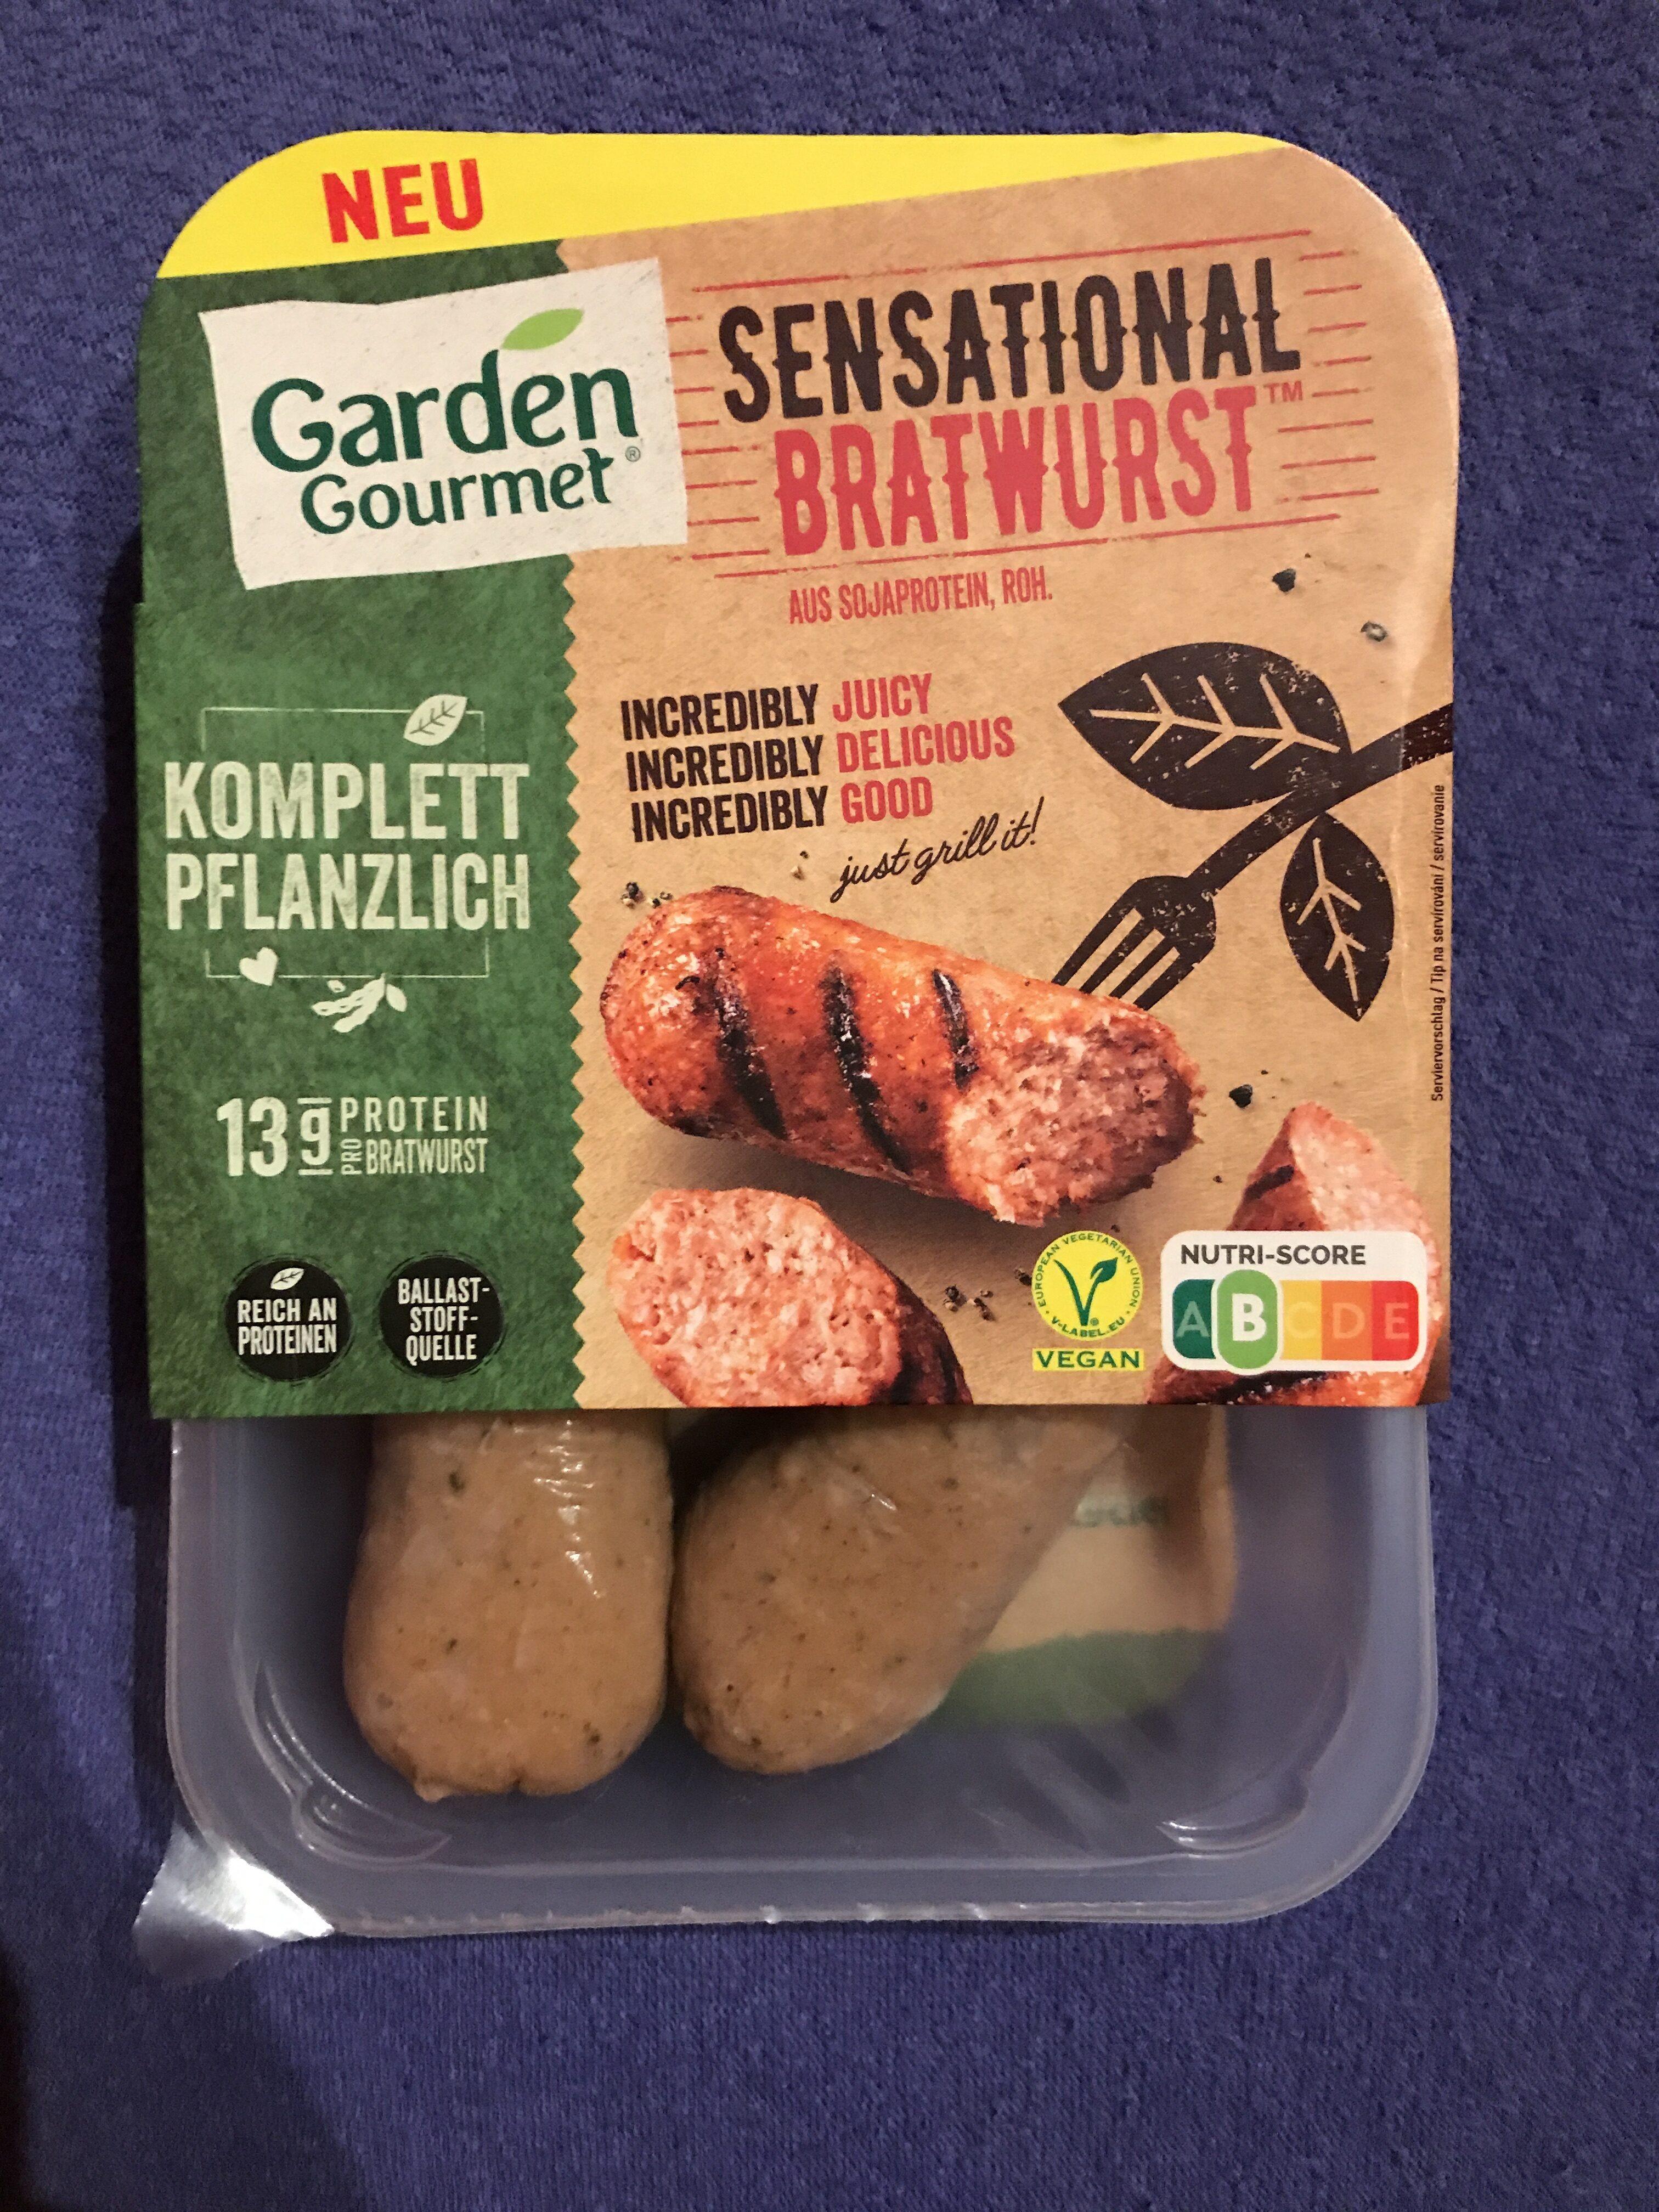 Incredible Bratwurst - Product - en